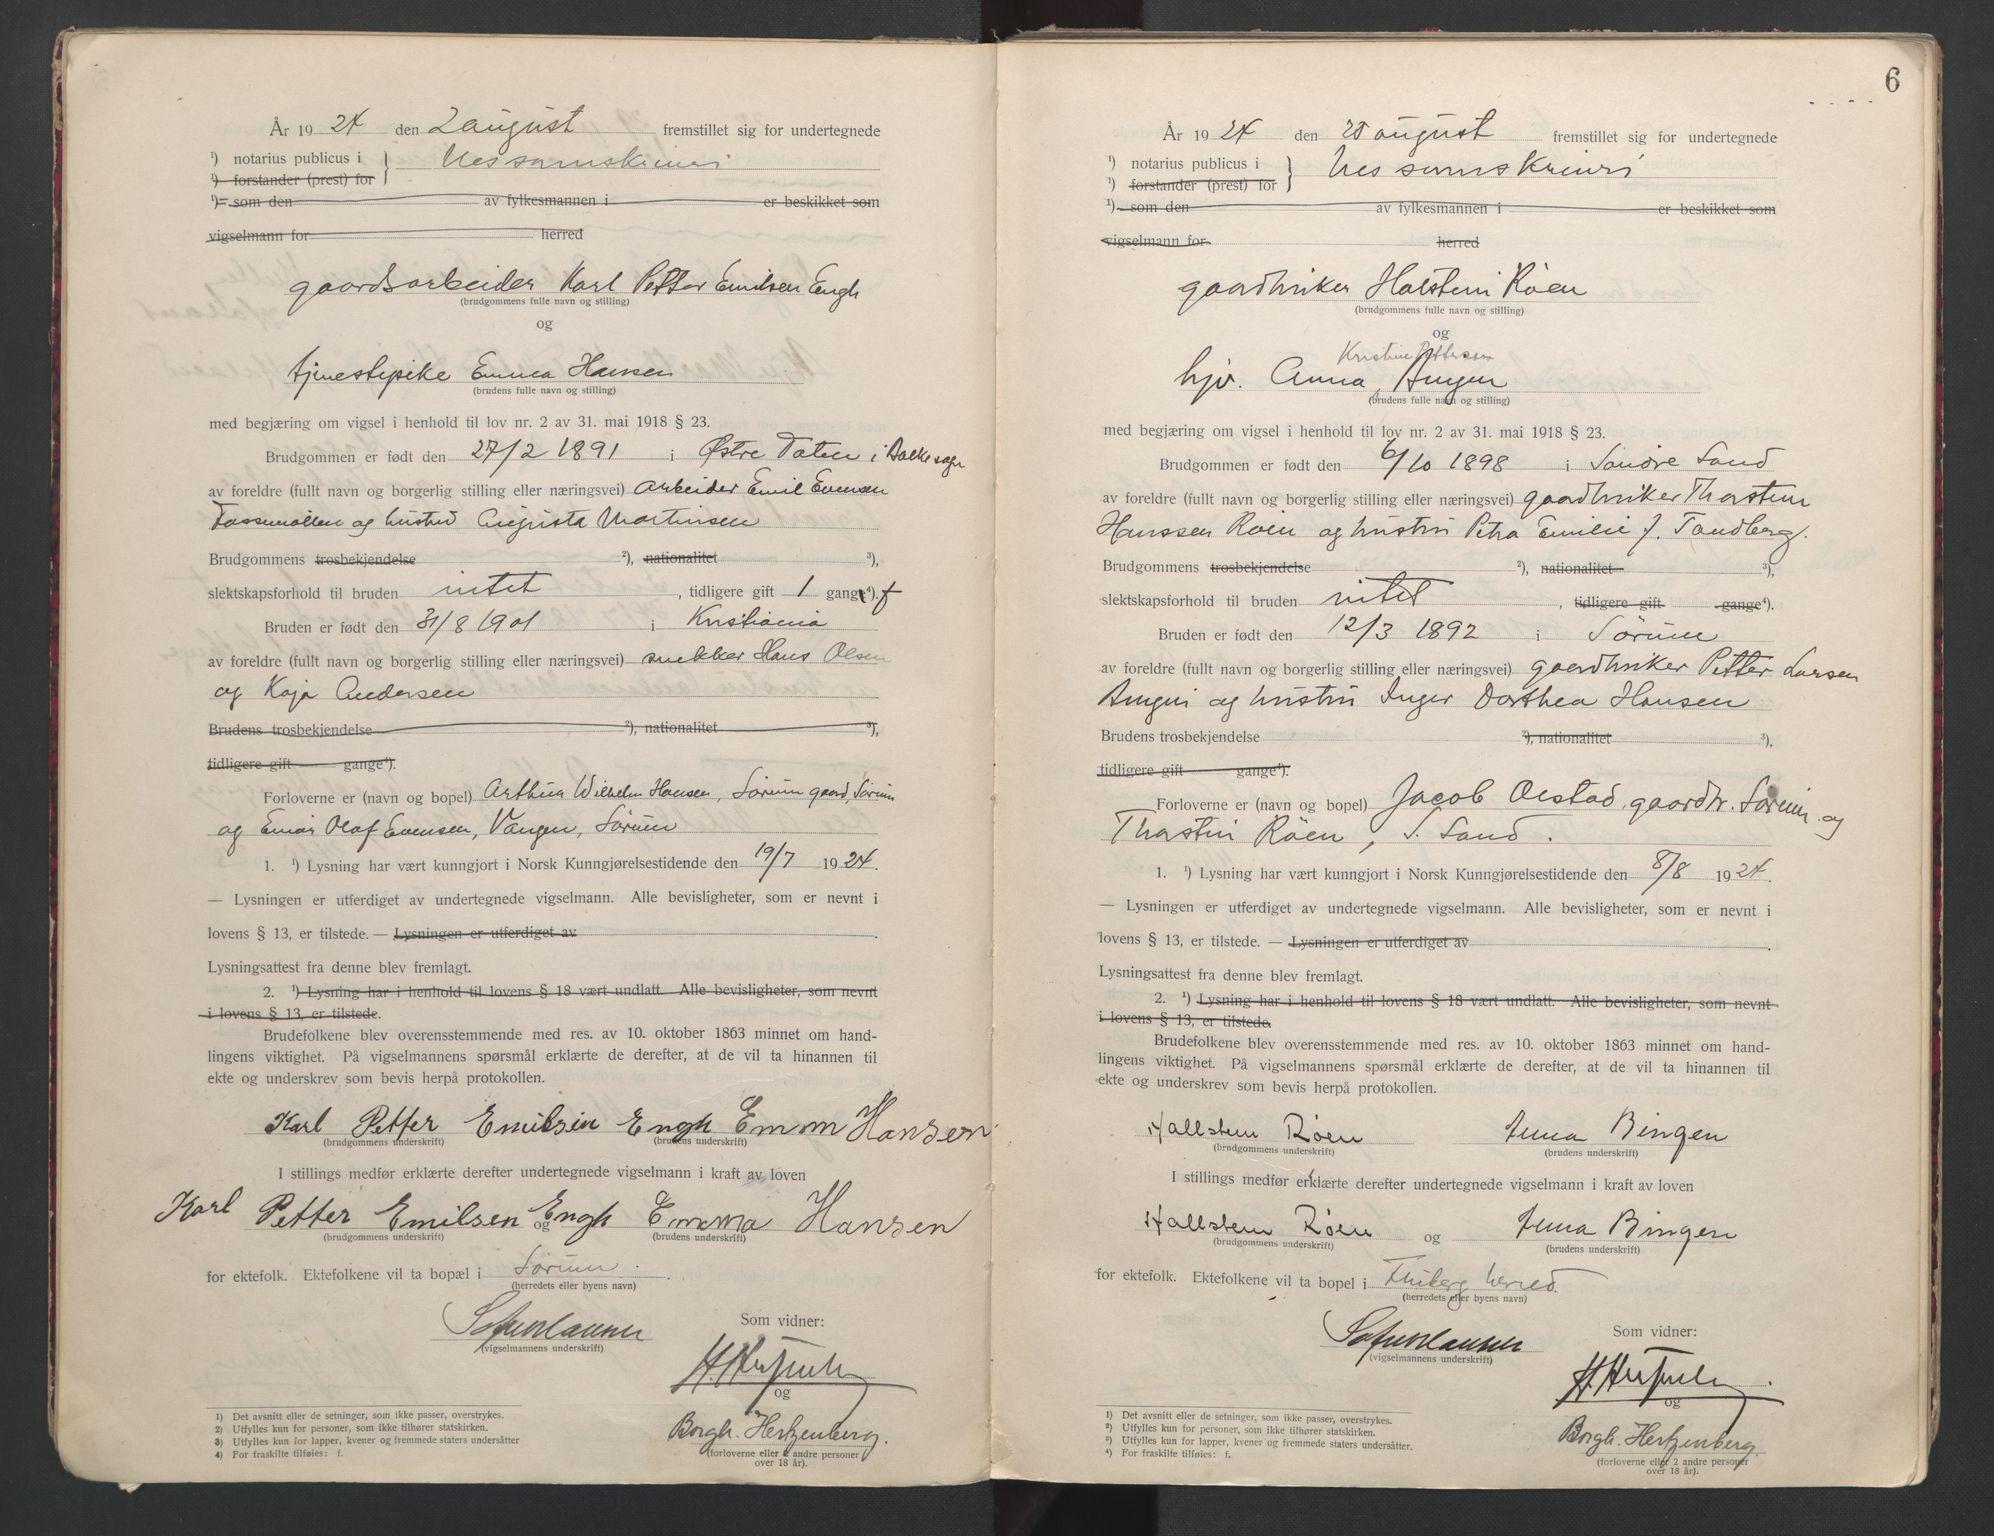 SAO, Nes tingrett, L/Lc/Lca/L0001: Vigselbok, 1920-1943, s. 6